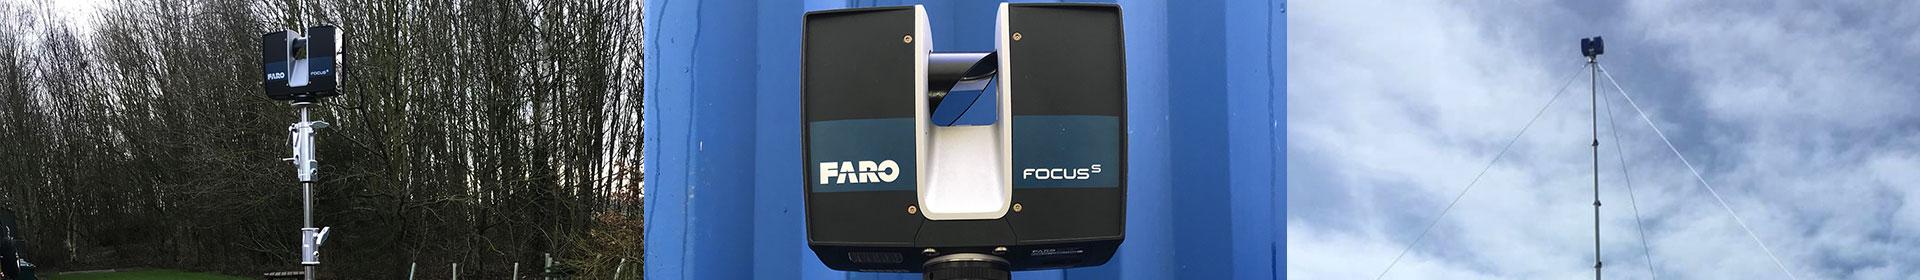 Laser Scanning Masts